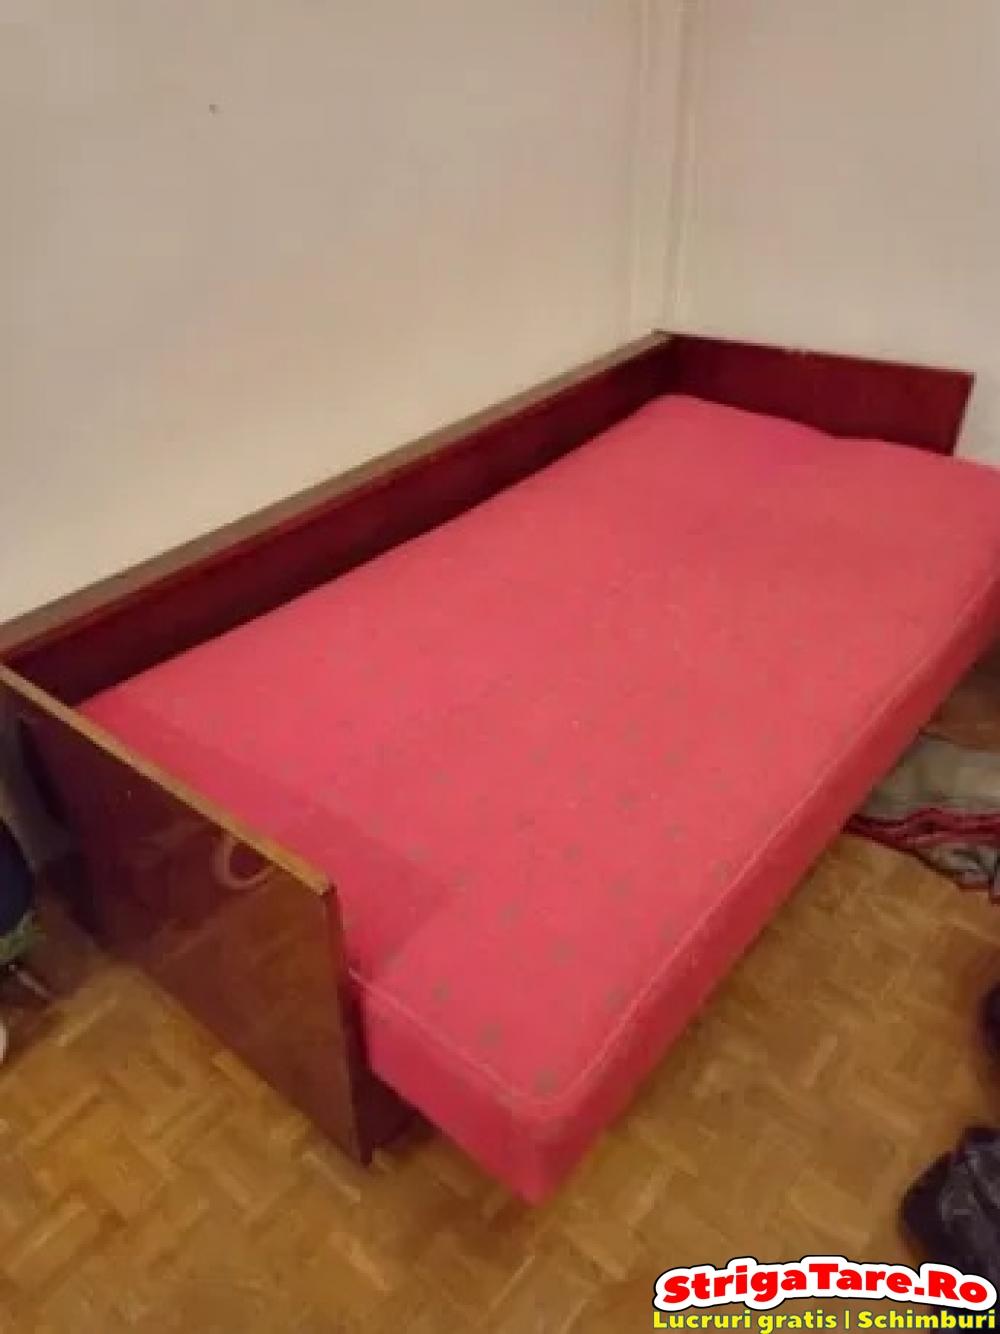 donez_casa_gradina_Mobila_Canapea_Donez_canapea_in_stare_buna_lucruri_gratis_Cluj_Cluj-Napoca_1582737544.jpg